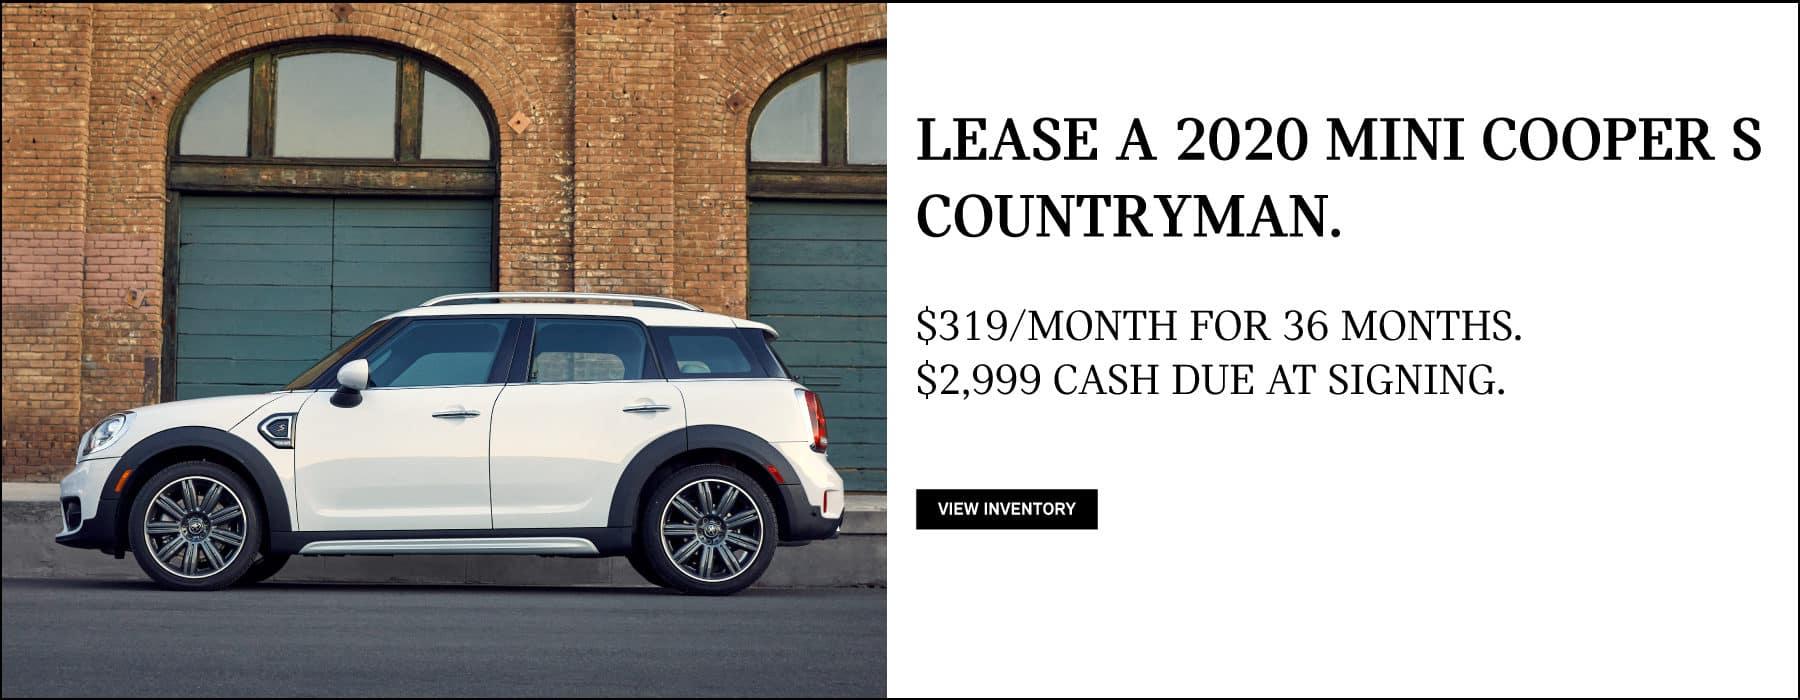 Lease a 2020 MINI Cooper S Countryman for $319/mo